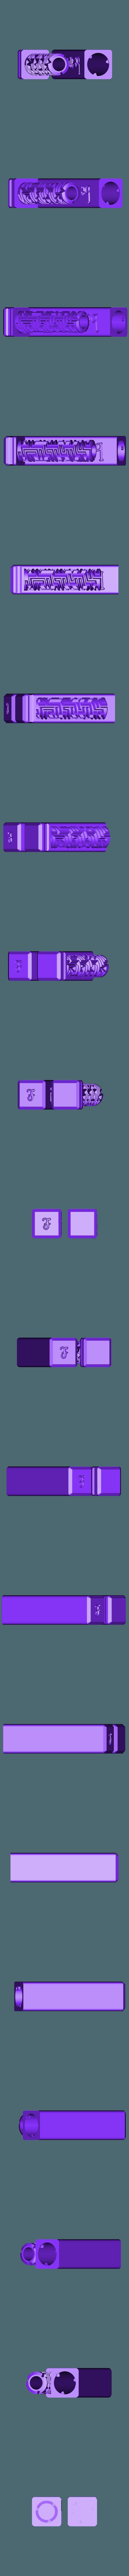 all-lottery-ticket-easy.stl Télécharger fichier STL gratuit Lottery ticket gift box • Plan imprimable en 3D, RevK